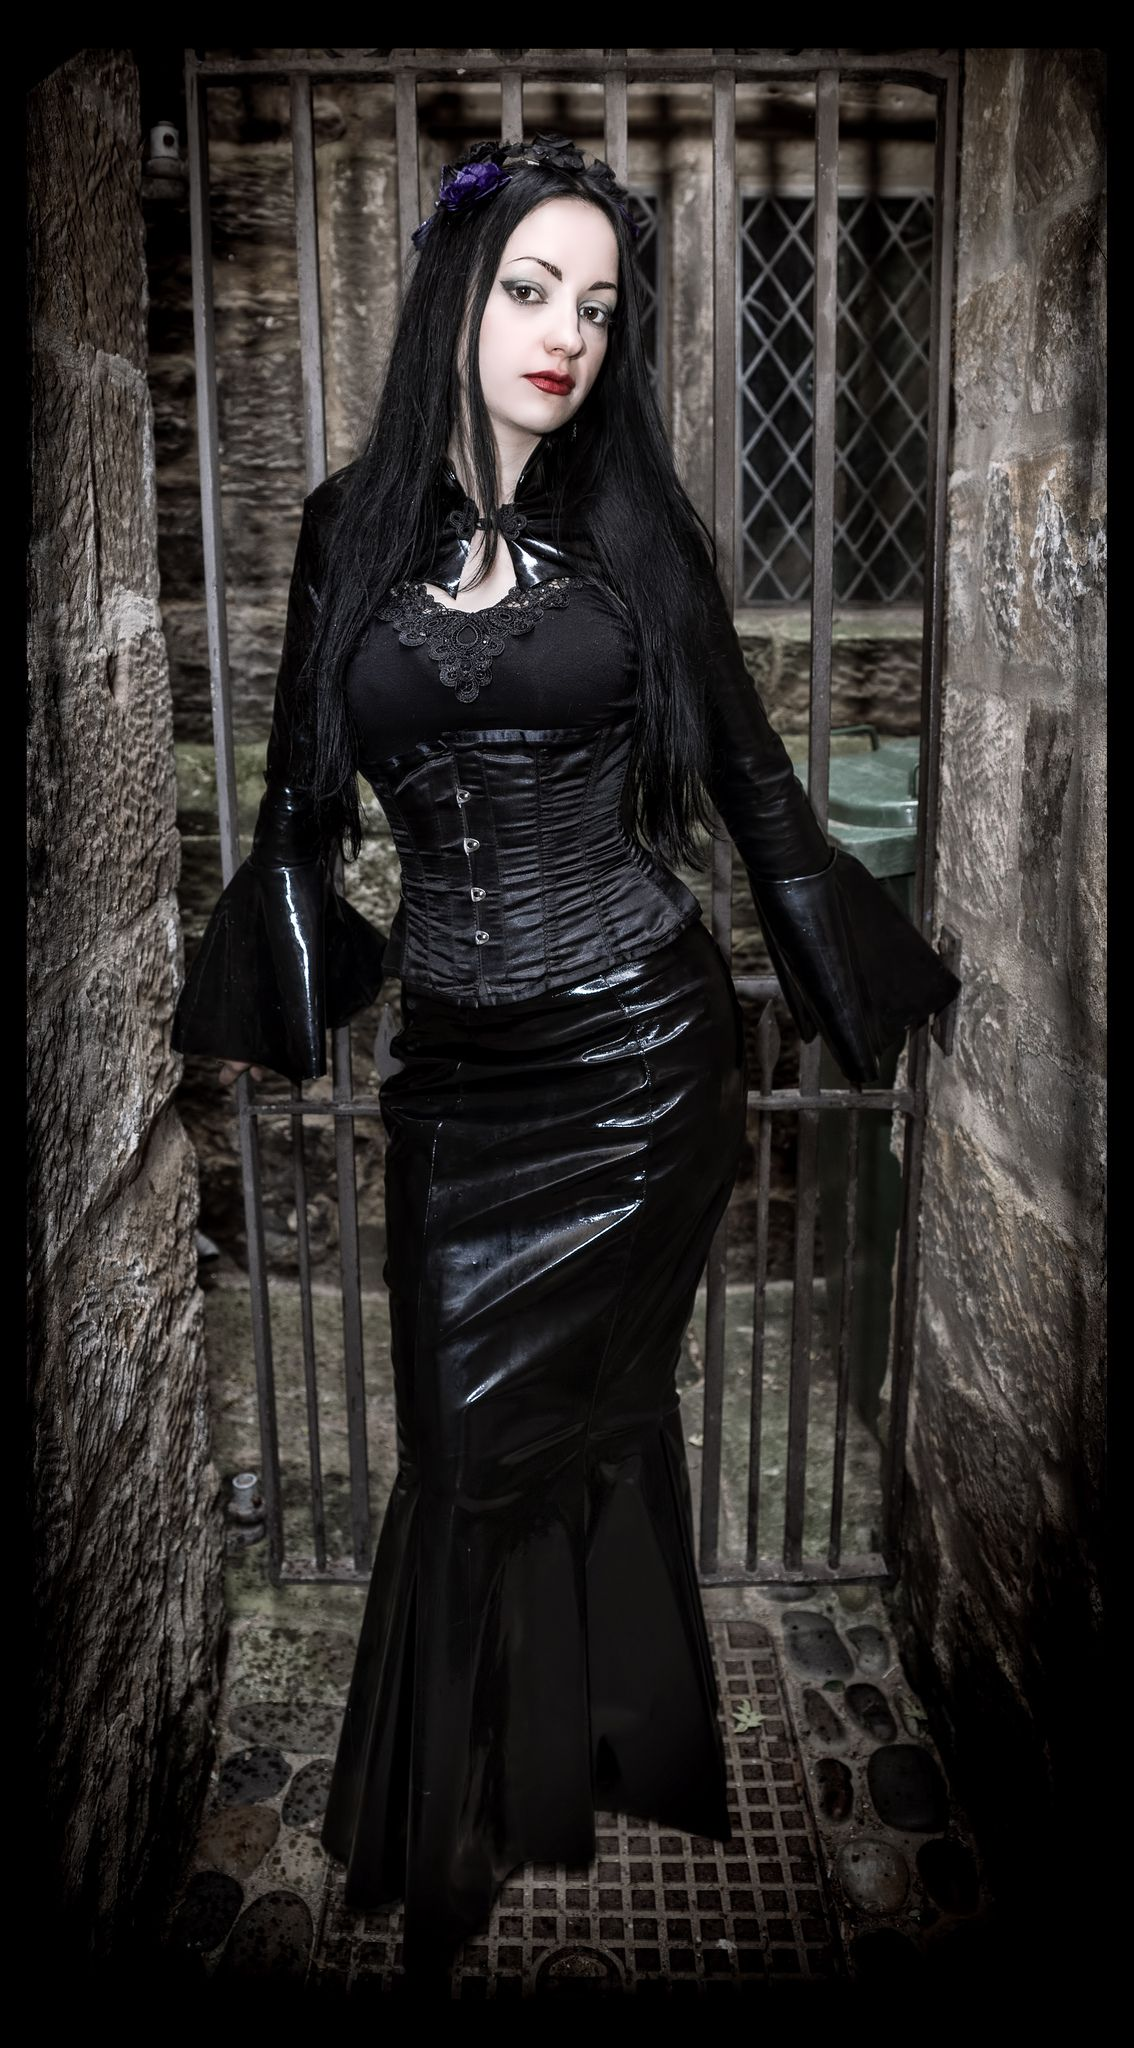 The Gothic Fashion Directory - The Gothic eZine